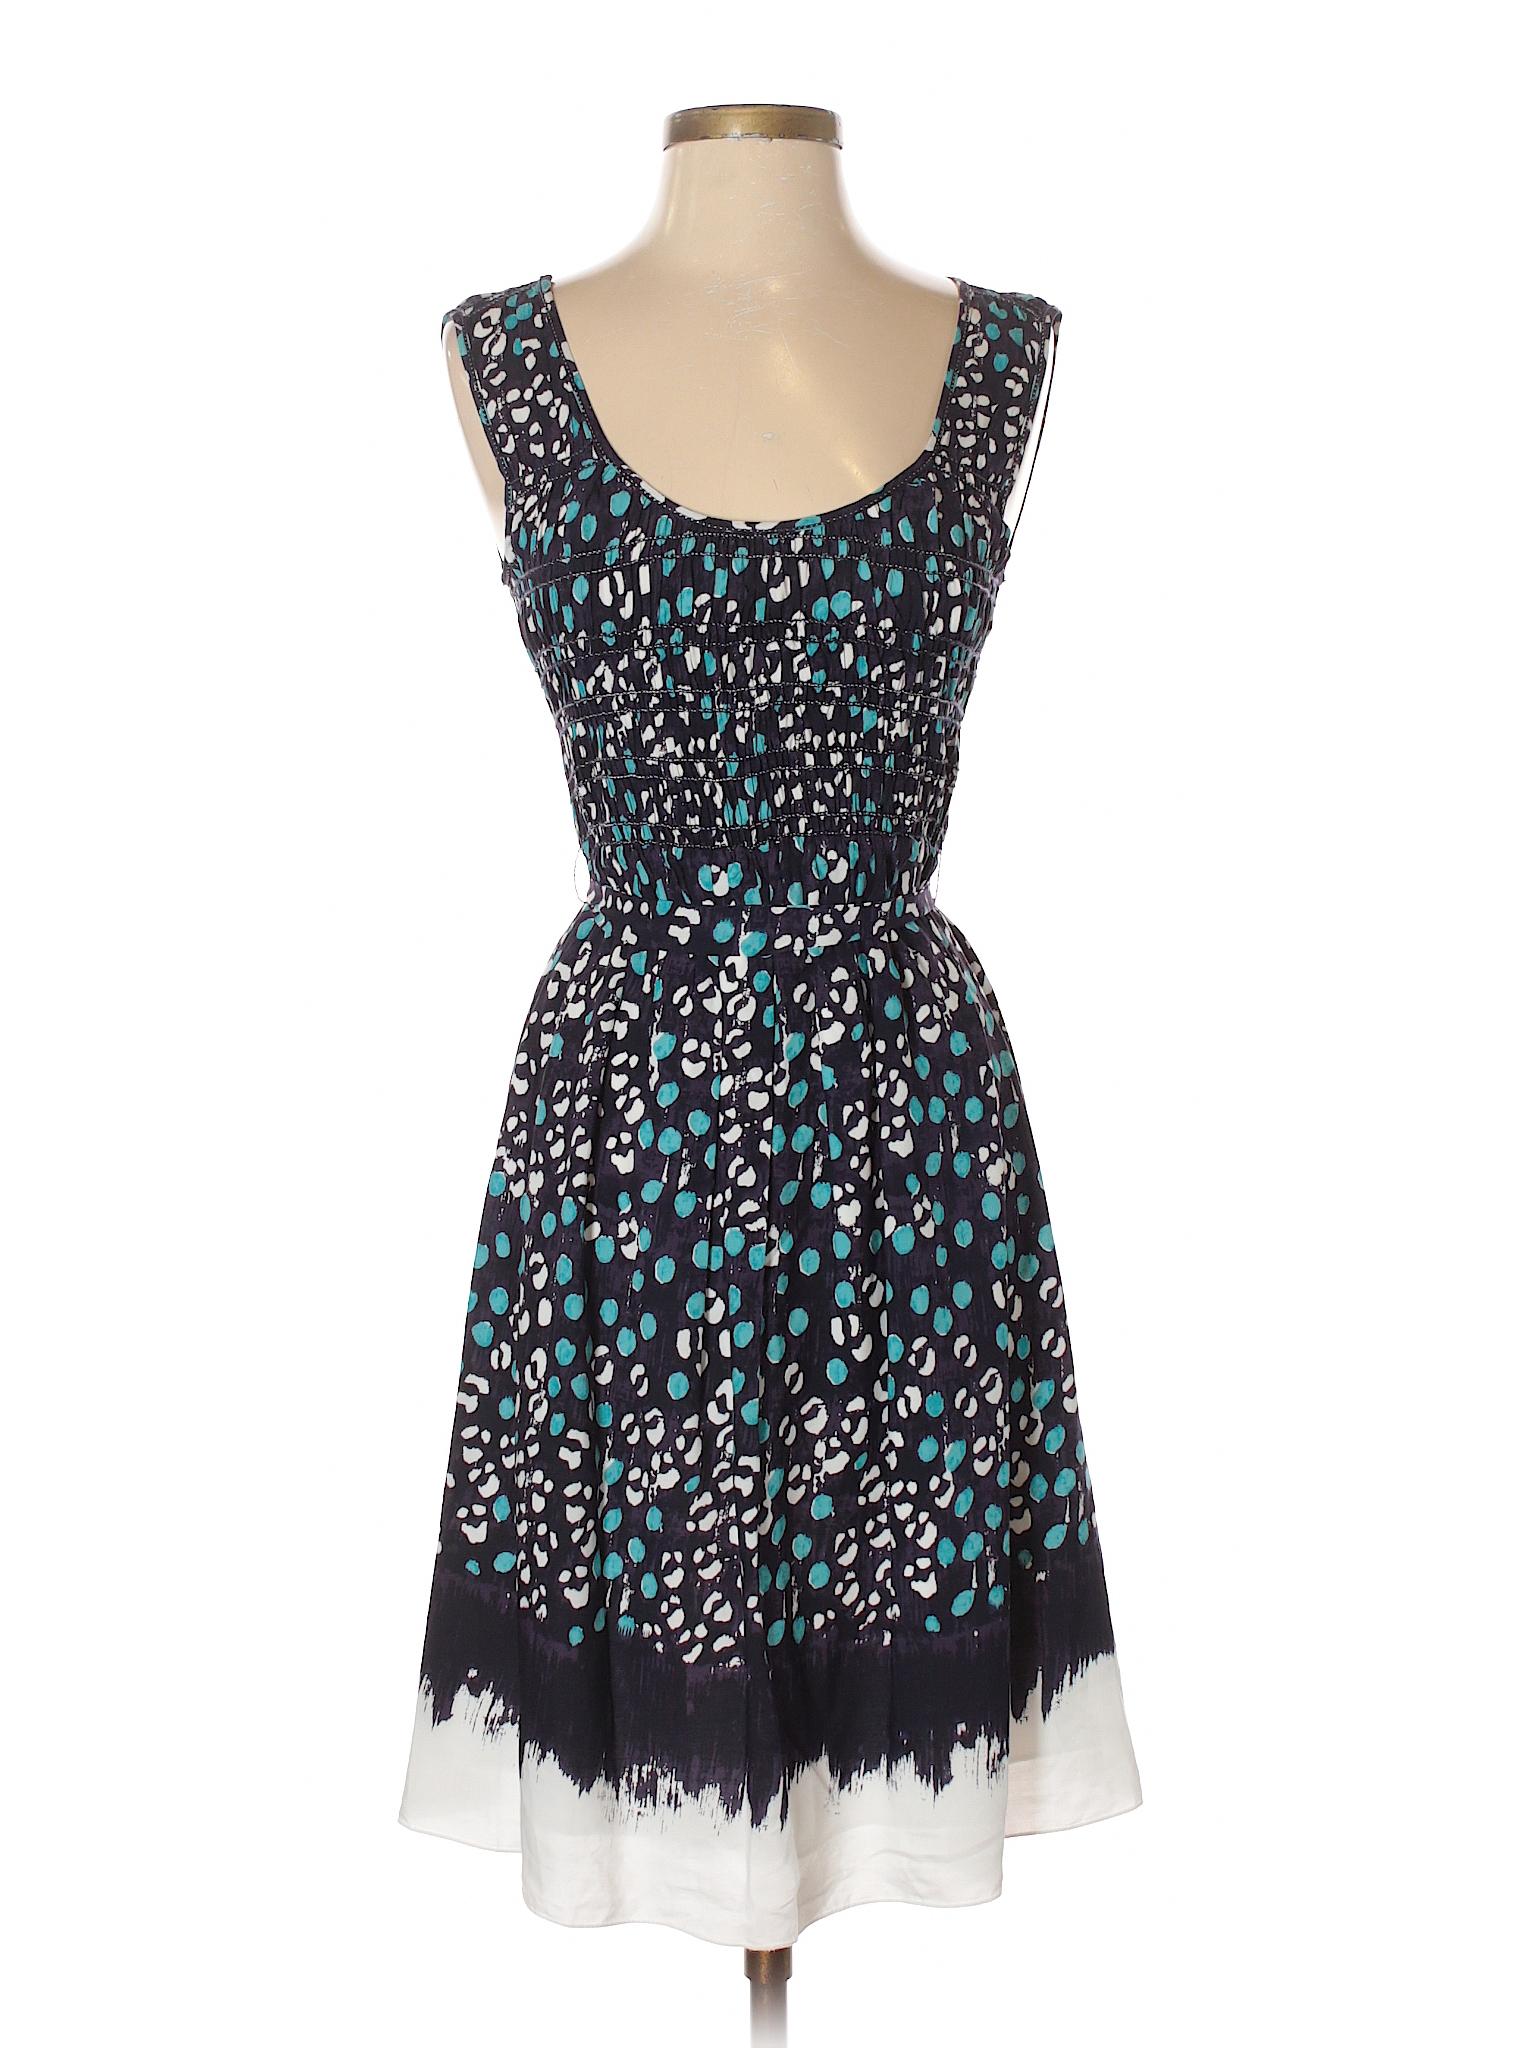 M Selling Dress Selling Selling Dress M M Studio Studio Studio Casual Casual Selling Studio Casual Dress FwqPfxO4n